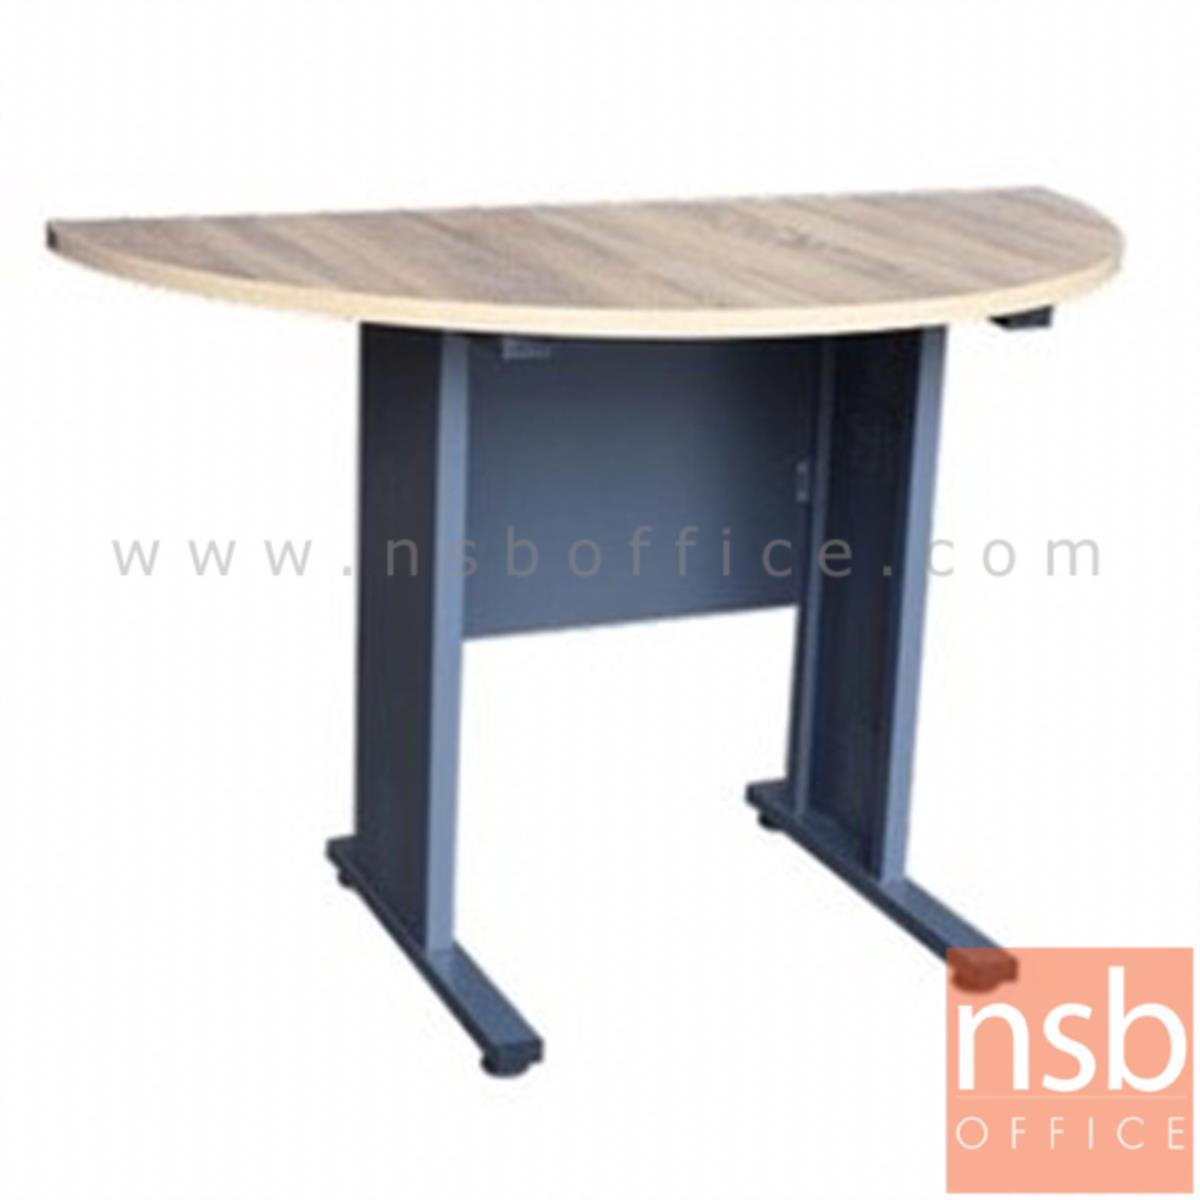 A10A071:โต๊ะเข้ามุม รุ่น Prodigy (โพรดิจี้) ขนาด 120W cm. ขาเหล็ก  สีโซลิคตัดเทาเข้มหรือสีมูจิตัดเทาเข้ม